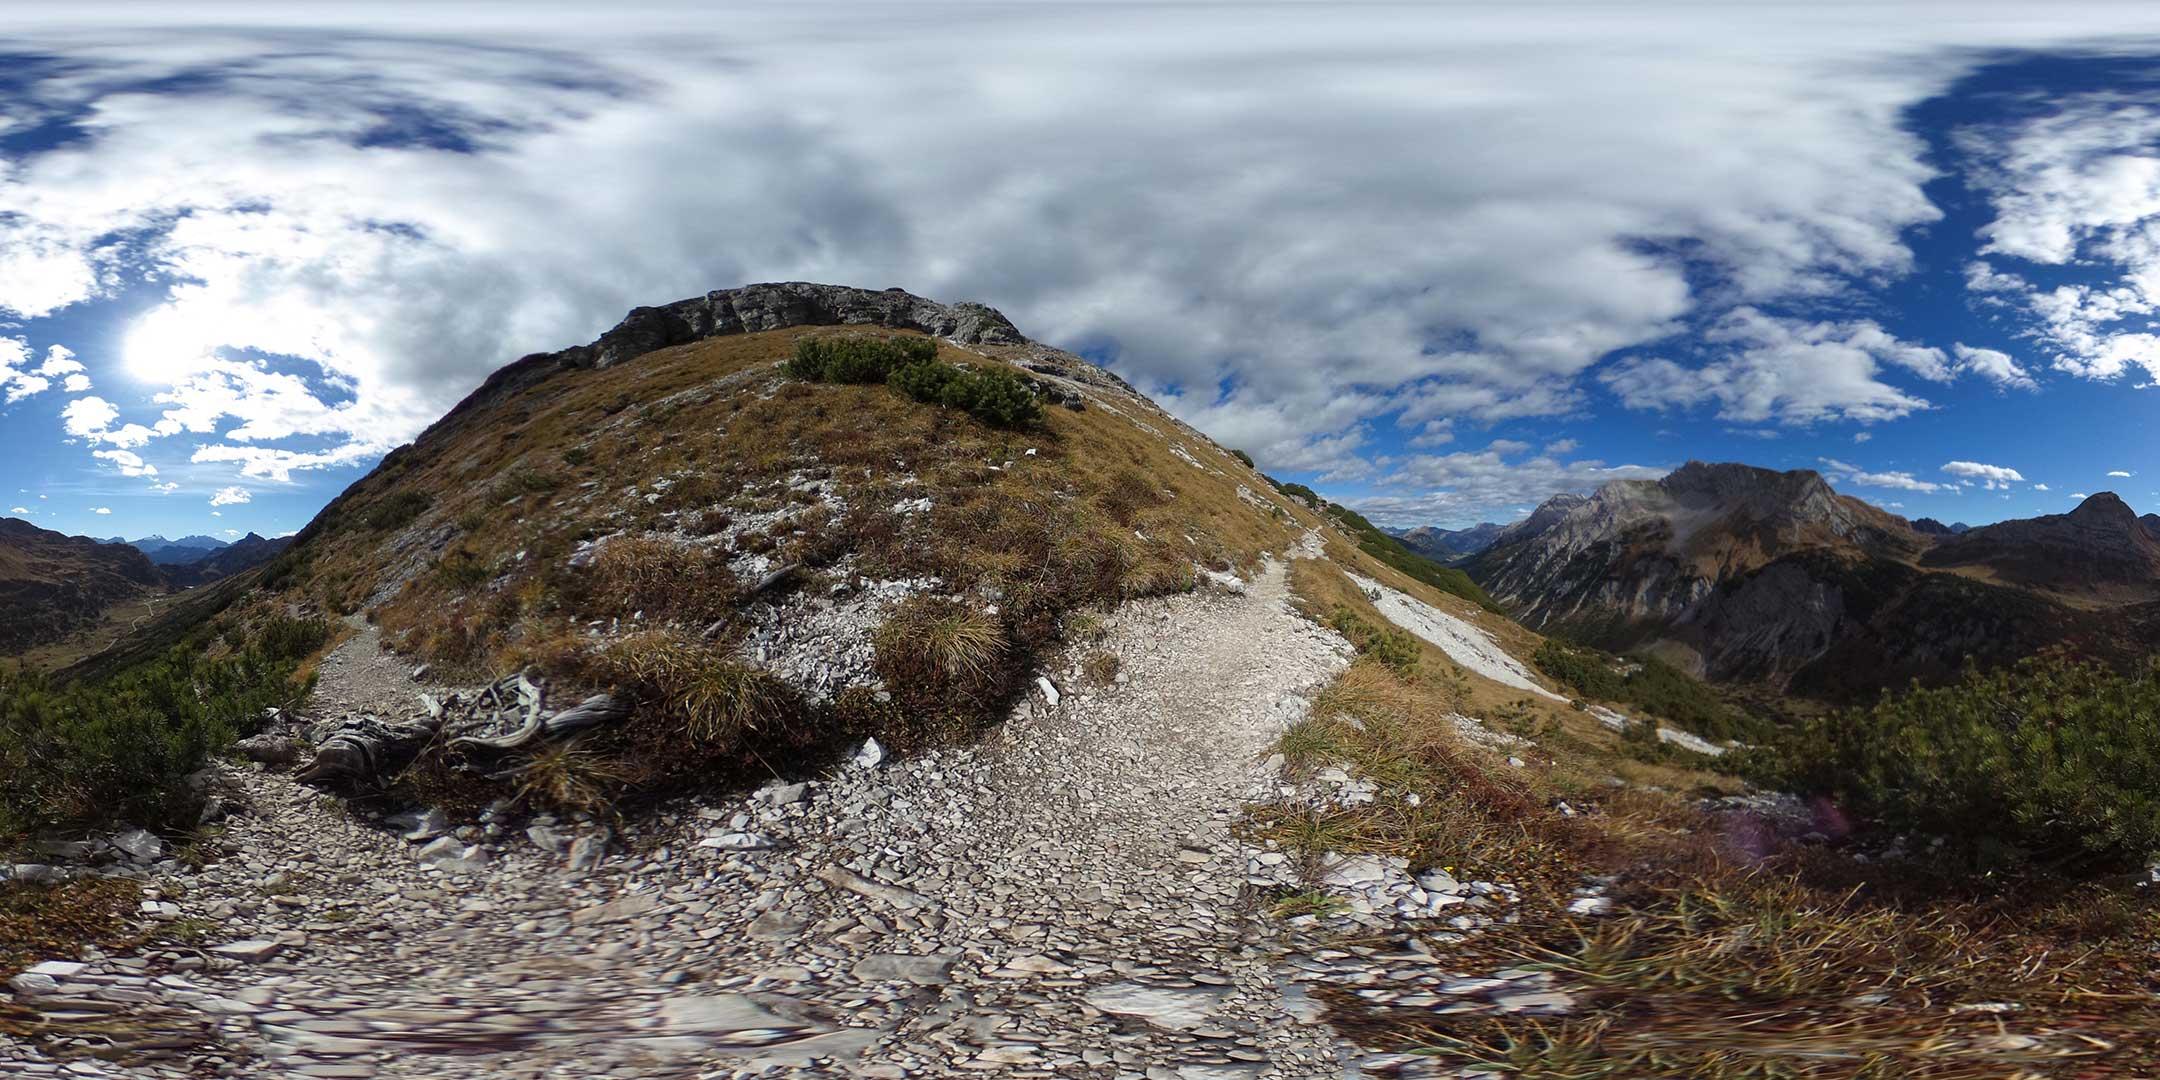 360grad-Panorama-Tour–Goeppinger-Huette-zur-Freiburger-Huette